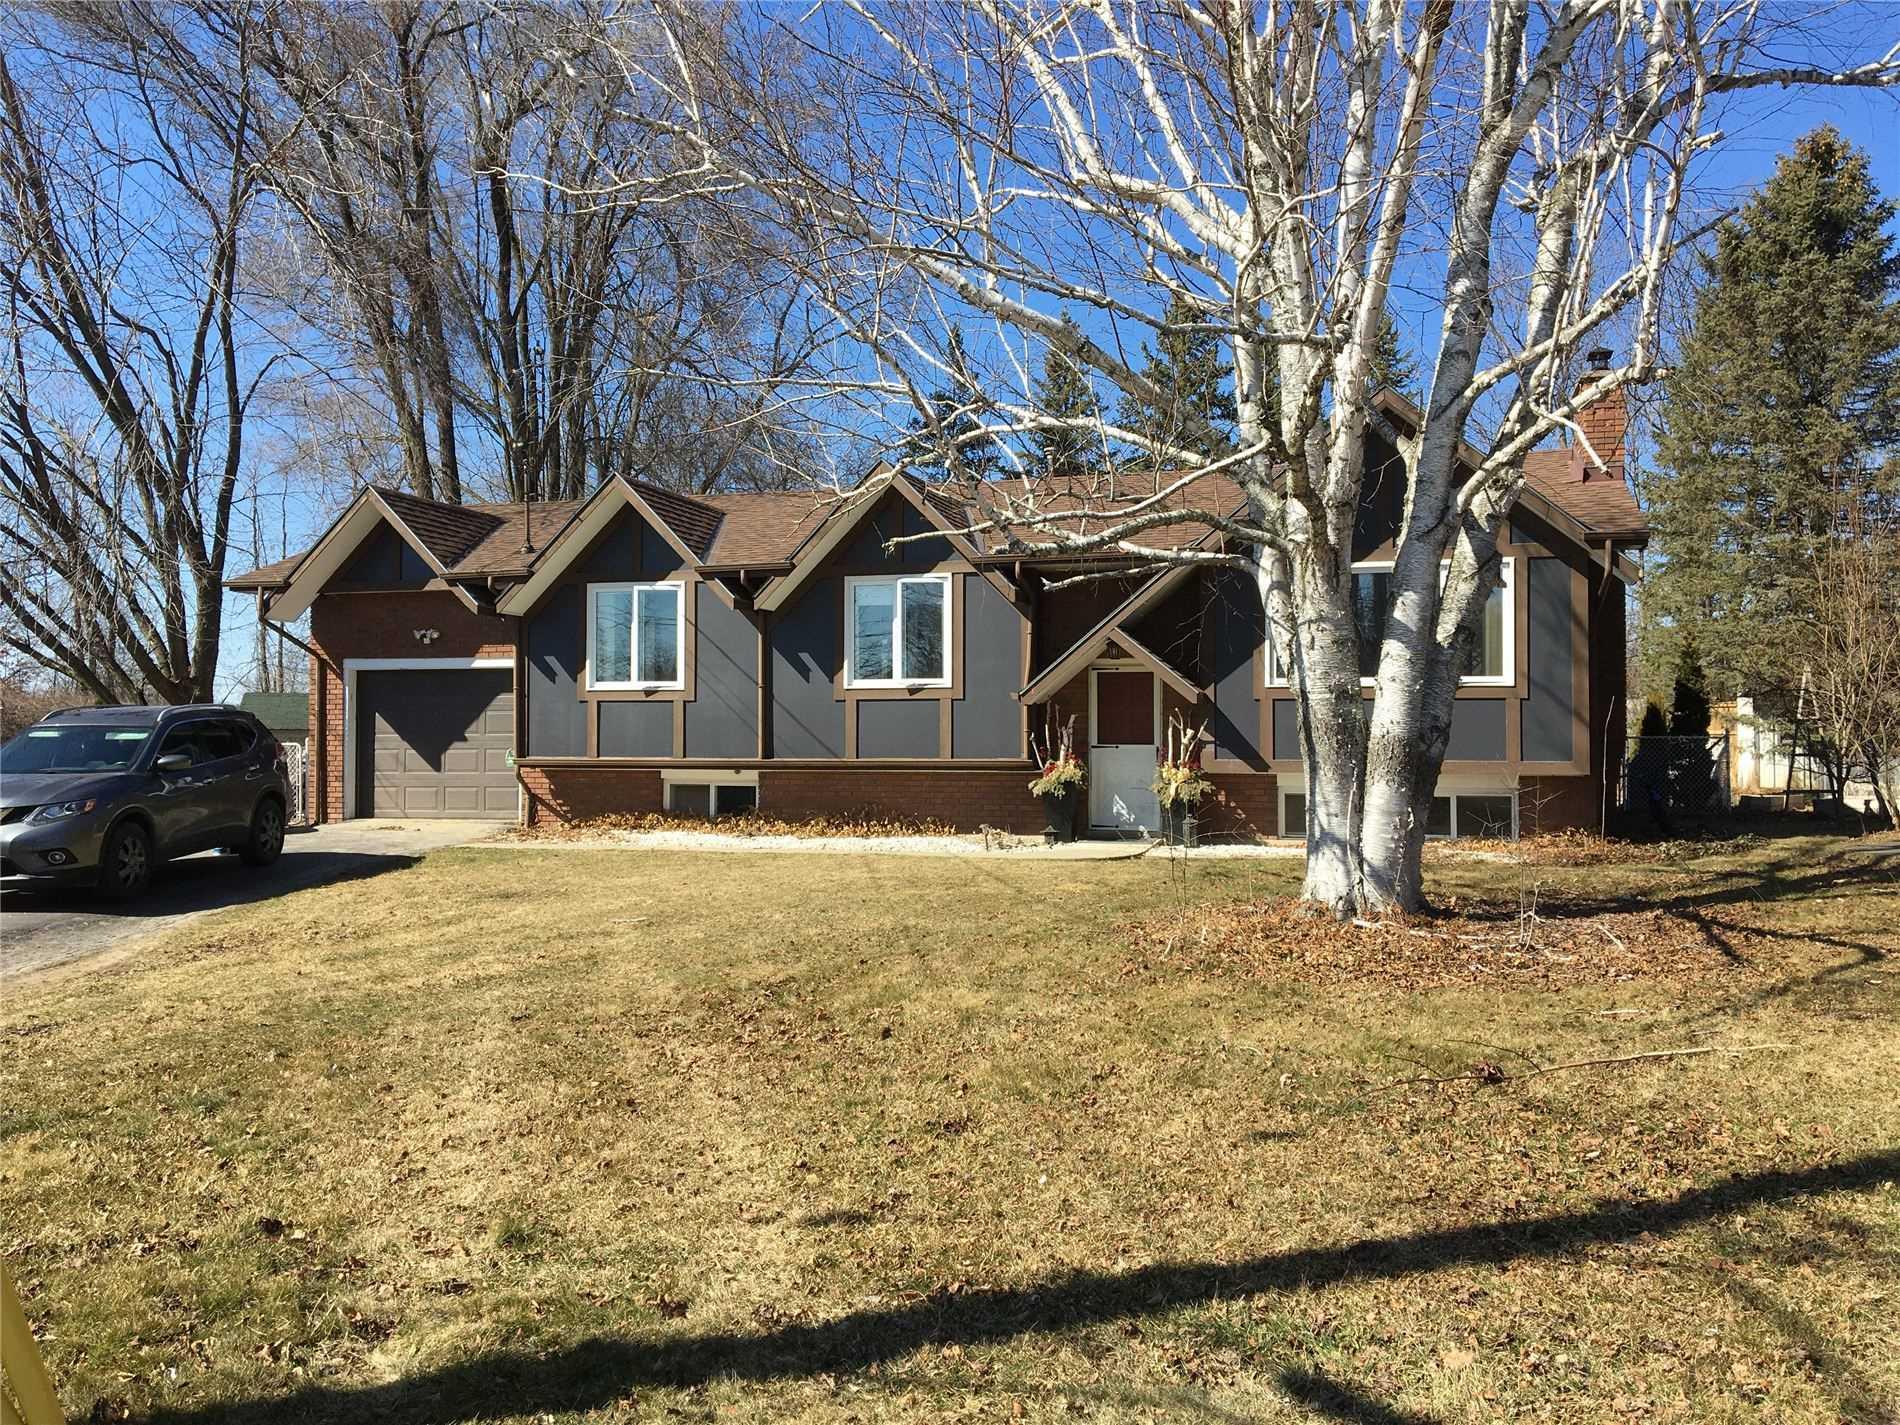 208 Maccrae Dr, Haldimand, Ontario N3W 1K5, 3 Bedrooms Bedrooms, ,2 BathroomsBathrooms,Detached,For Sale,Maccrae,X5161731